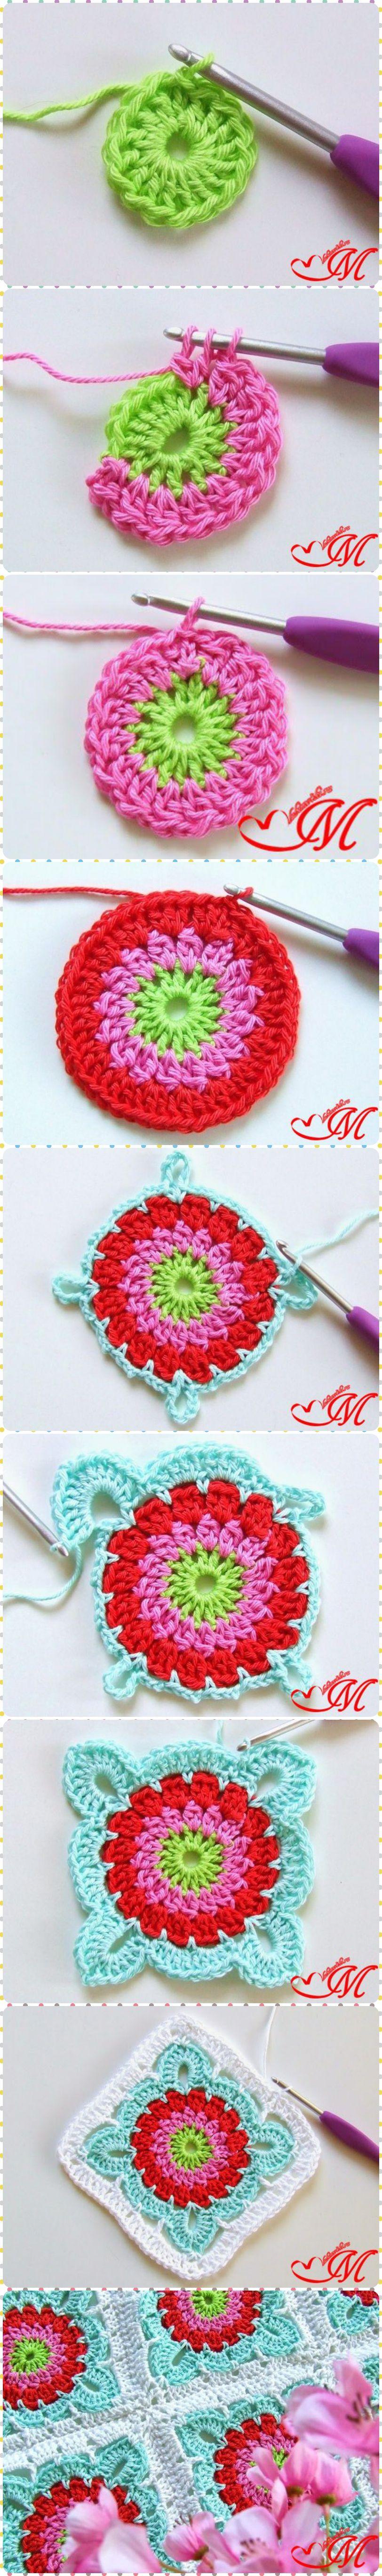 How to Crochet Granny Square Blanket | Como tejer, Colchas y Tejido